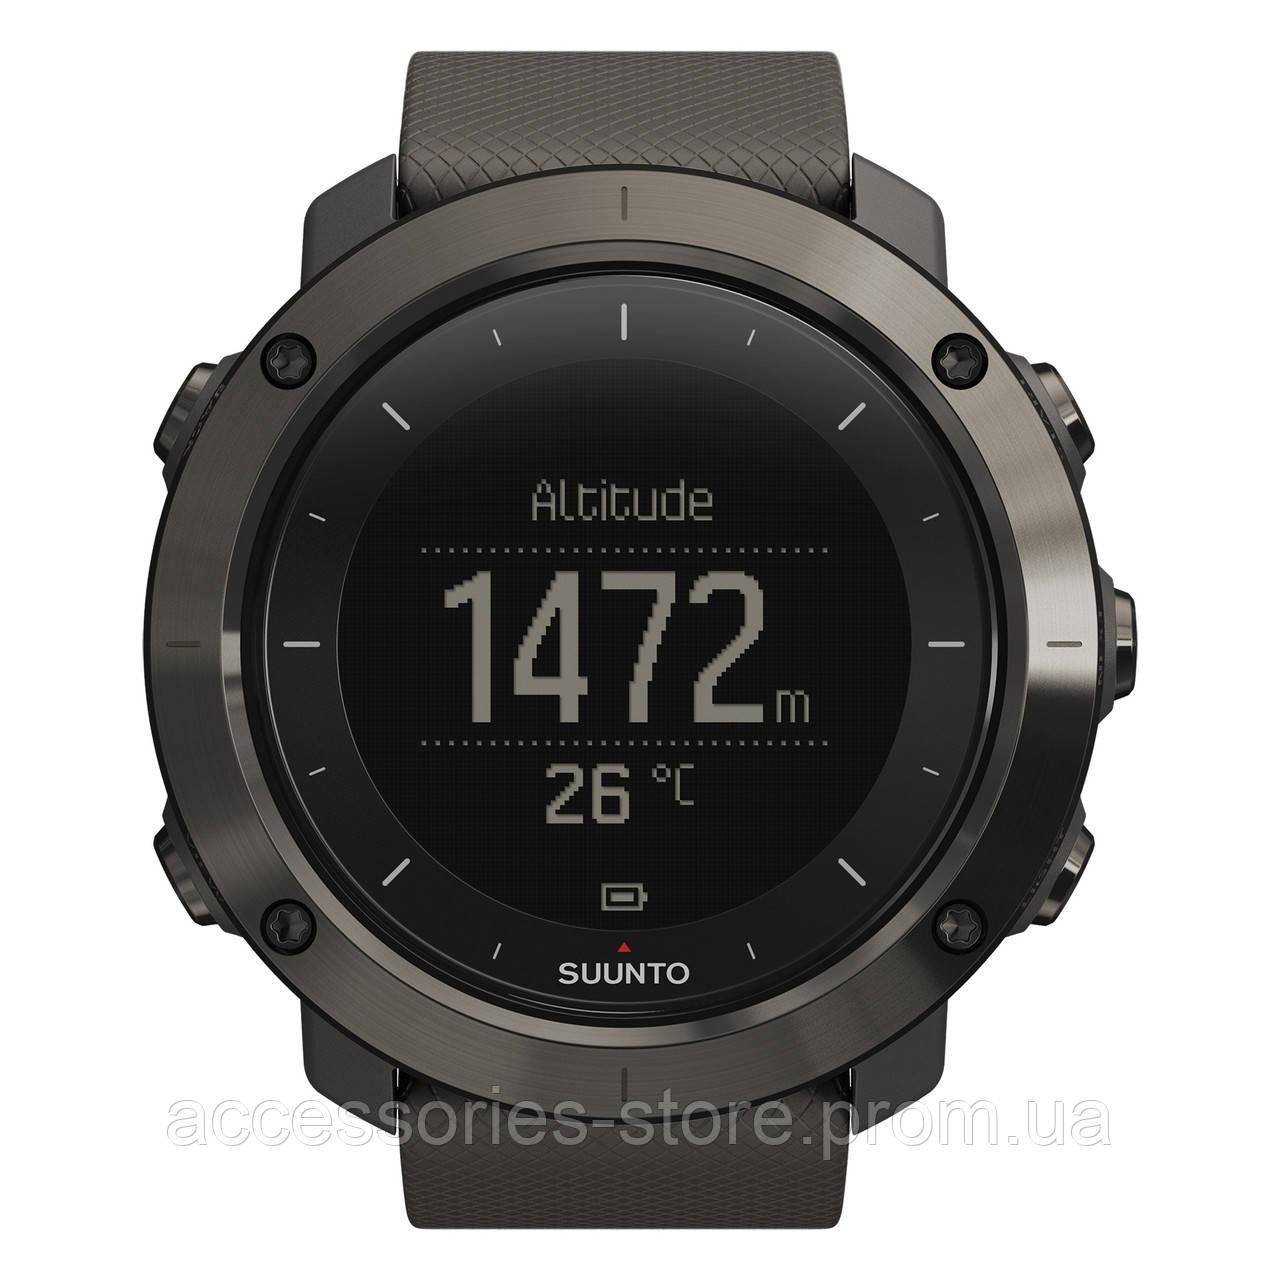 Наручные часы Volvo Suunto Traverse Graphite watch